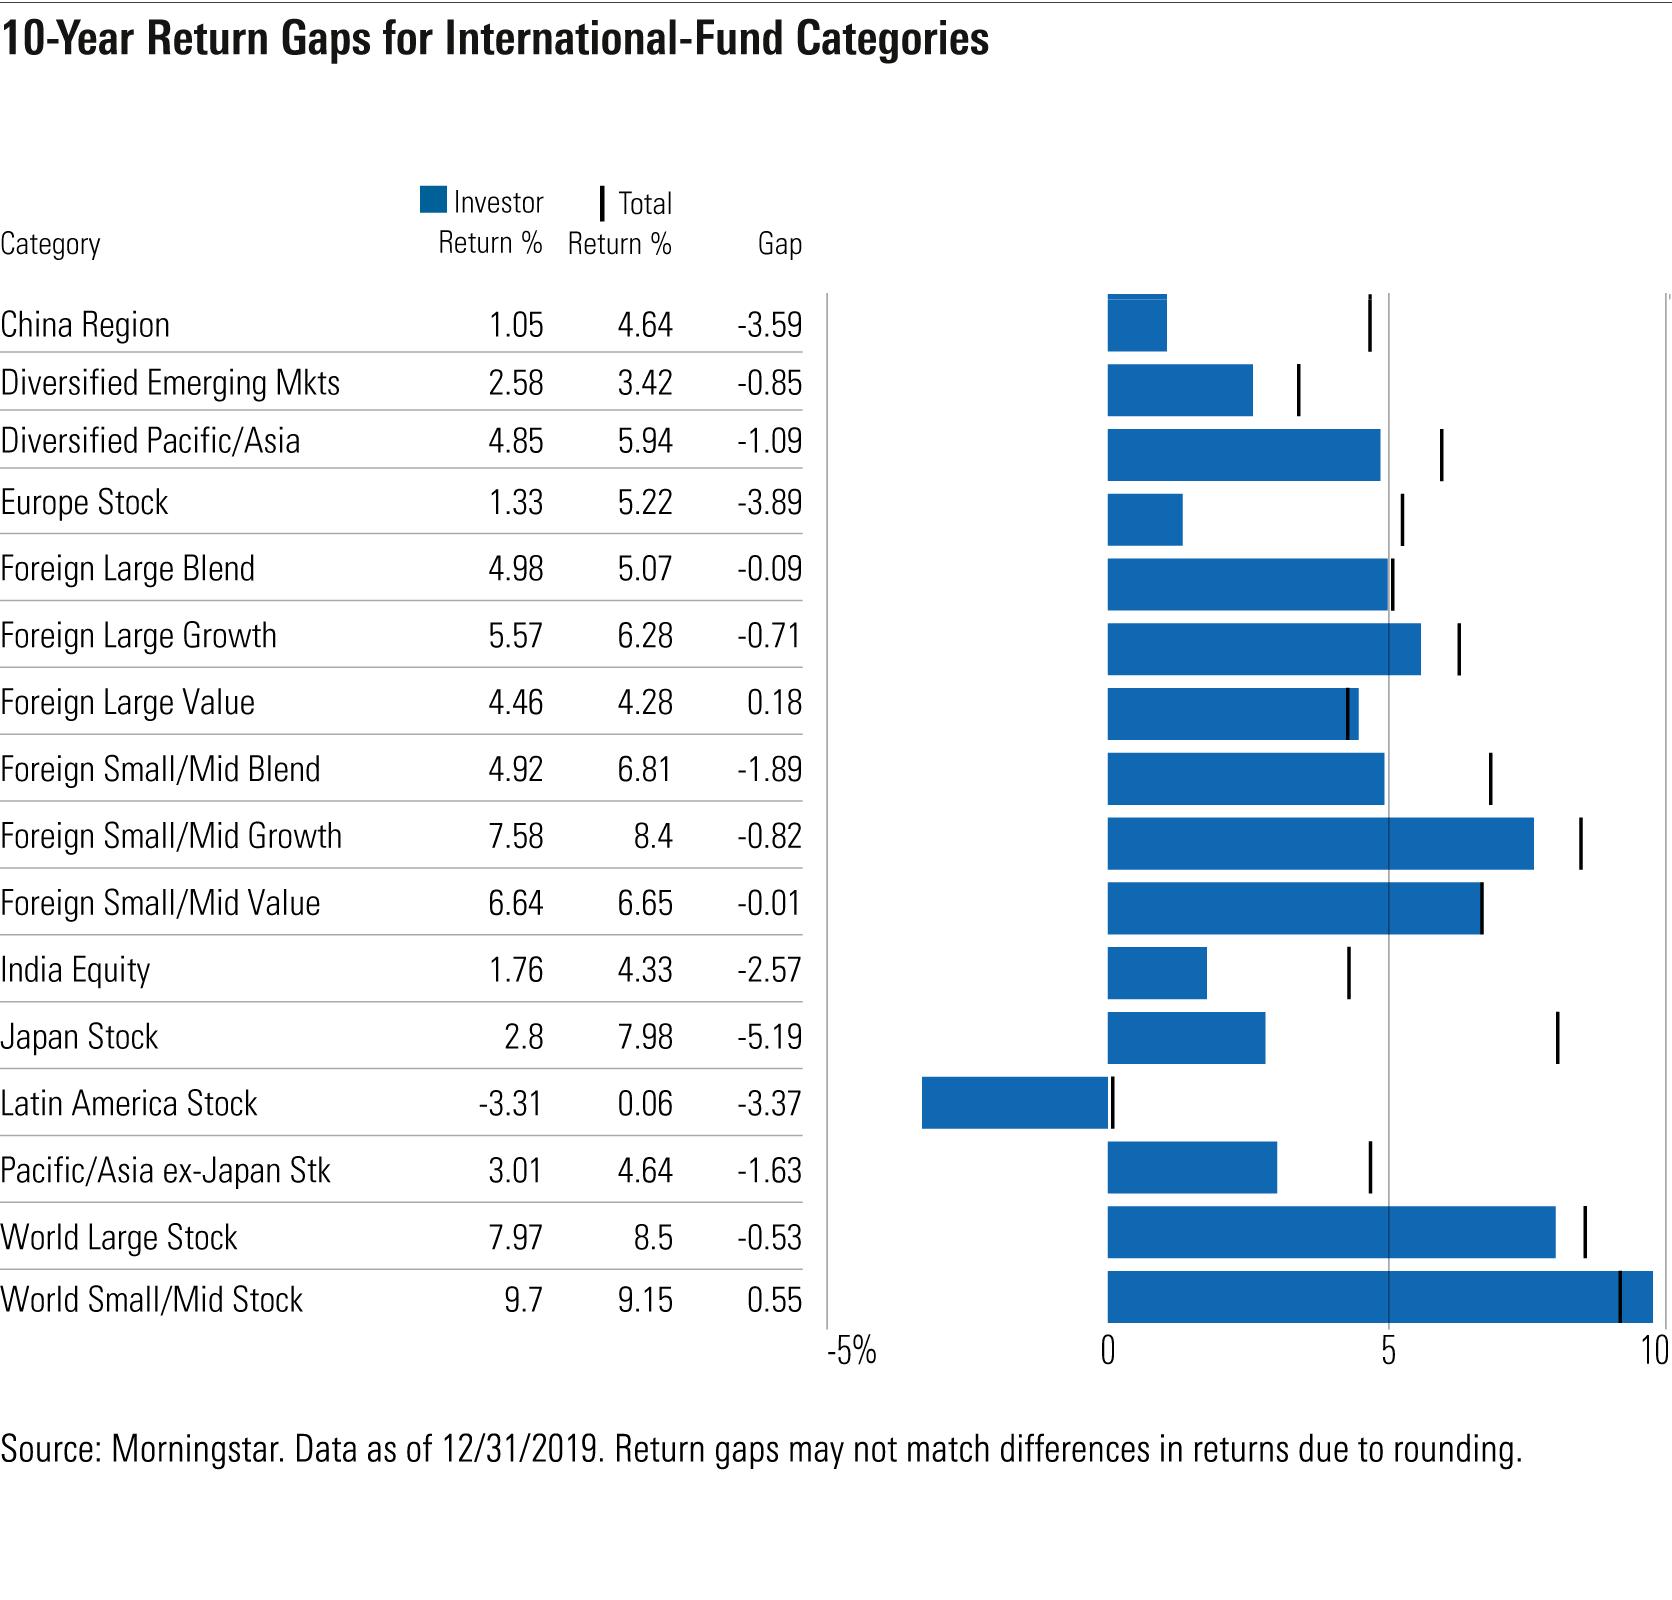 A chart showing 10yr return gaps for international-fund categories